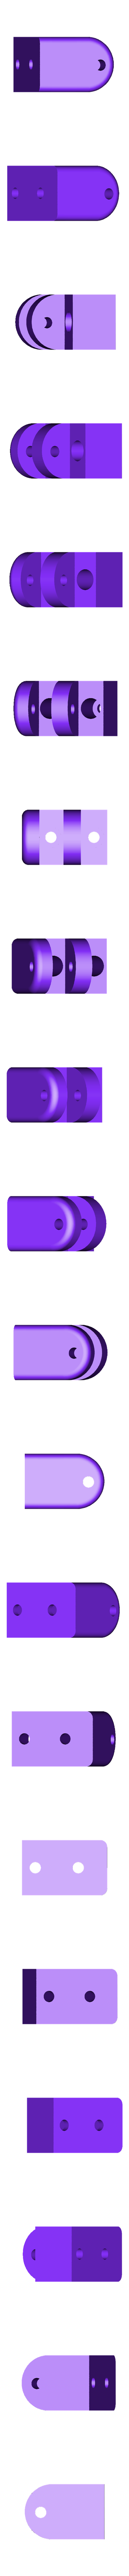 Rear_Pivot.stl Download free STL file Experimental Multirotor • 3D printable model, SeanTheITGuy